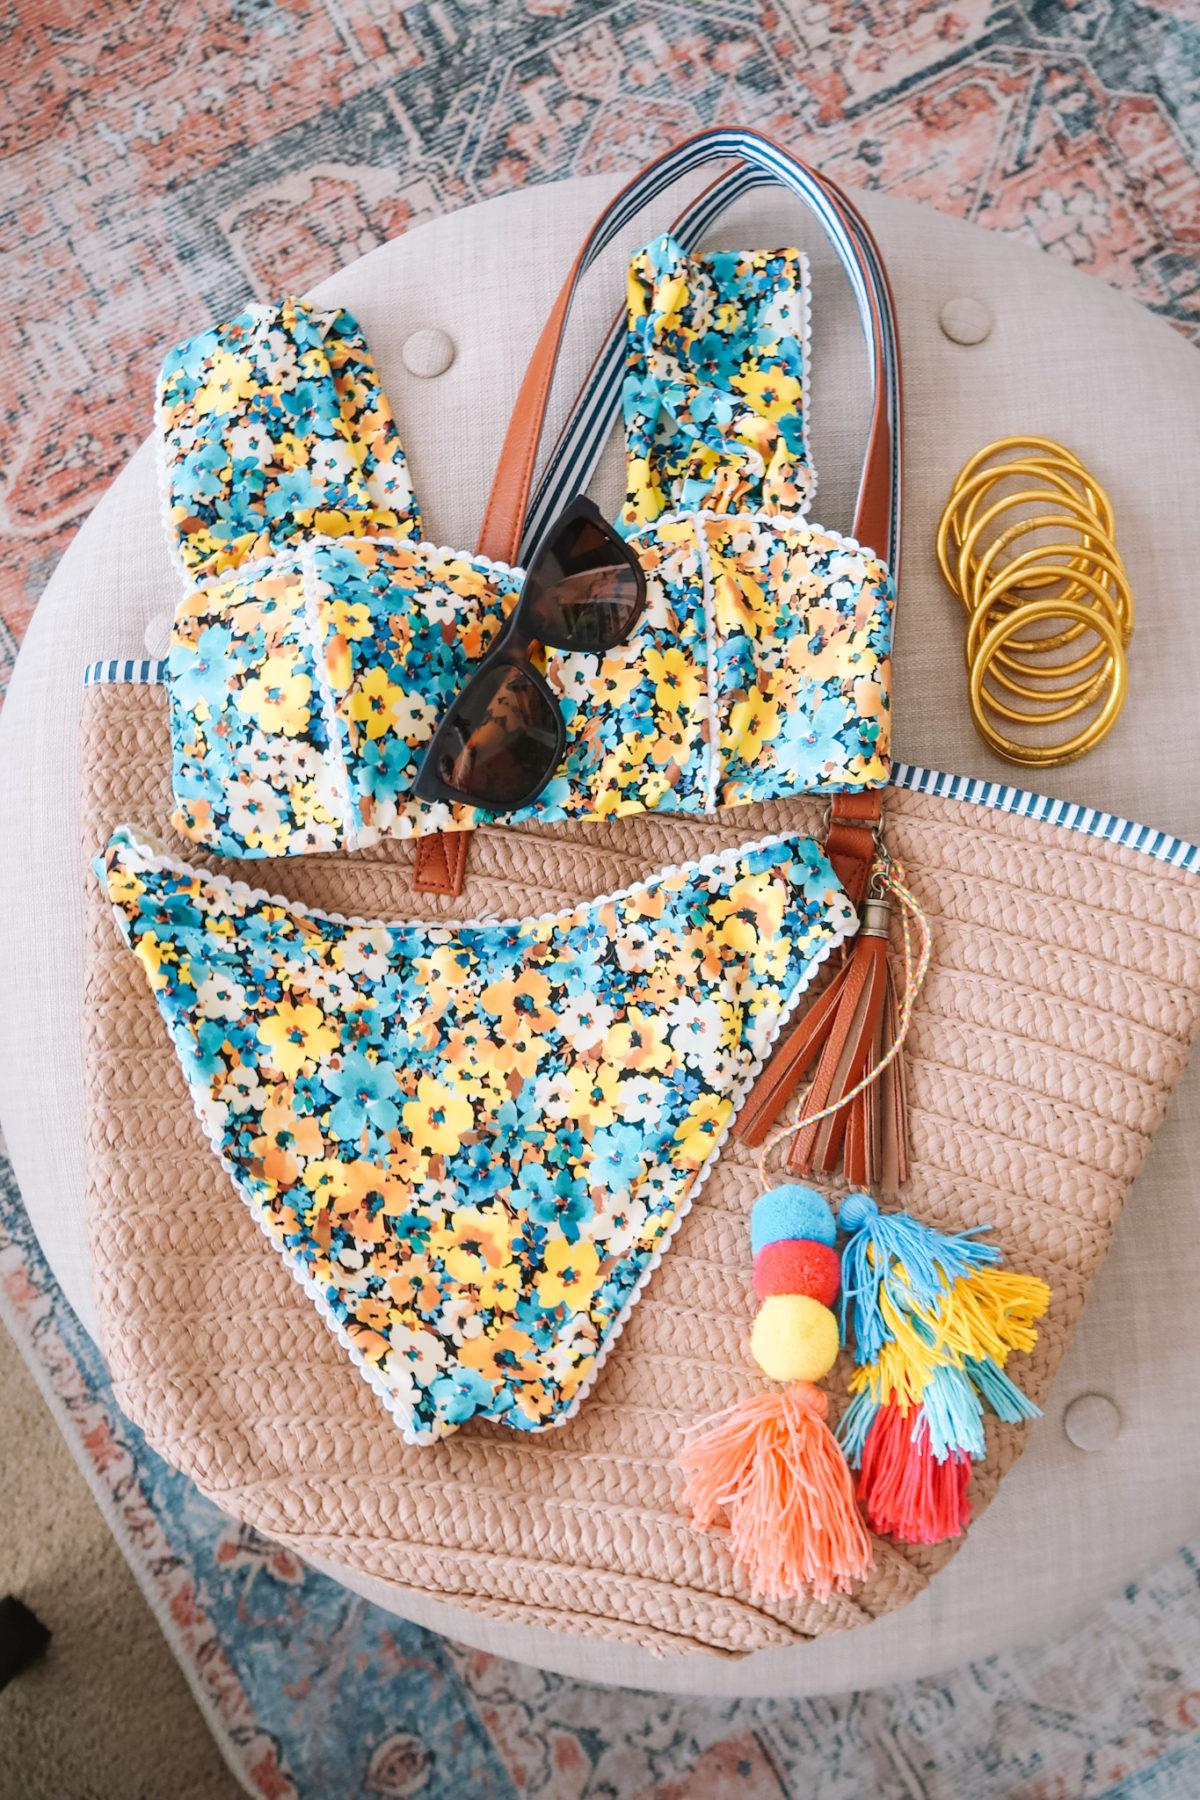 Packing Essentials, Floral Bikini, Tote Bag, Bangles, Sunglasses